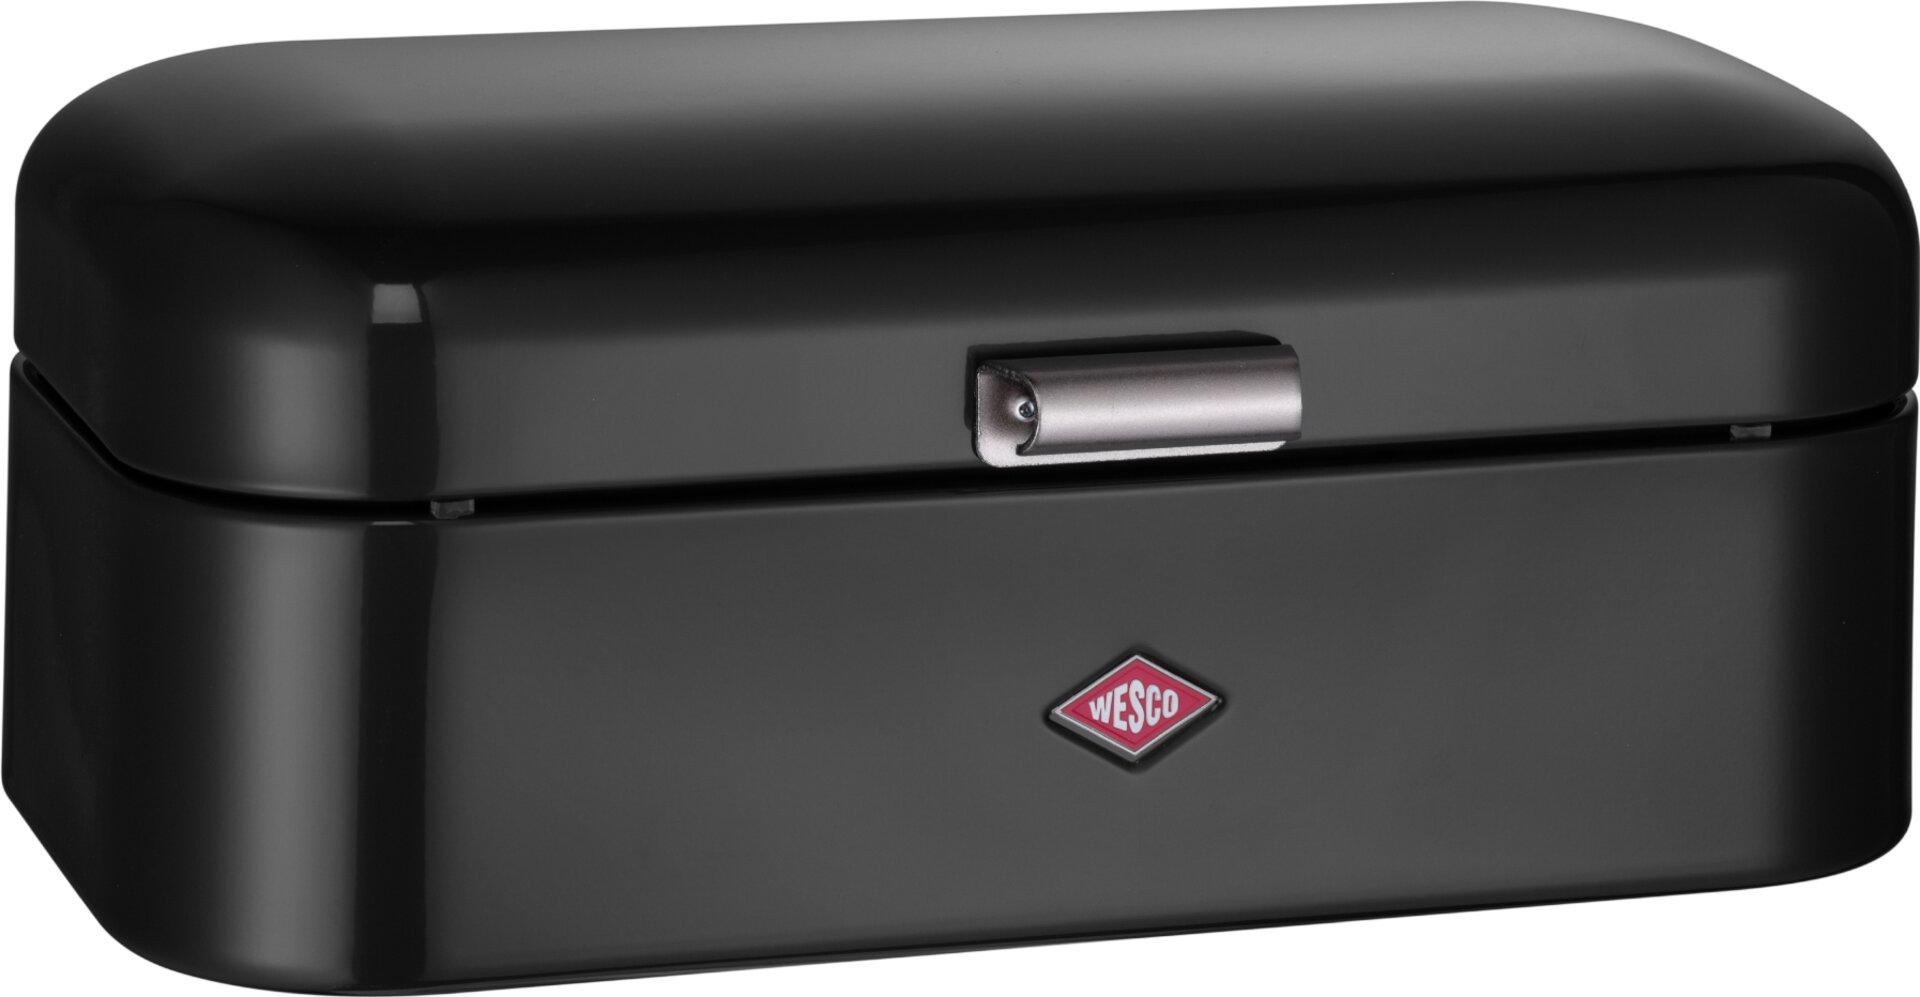 Brotkasten Grandy Wesco Metall schwarz 22 x 17 x 42 cm